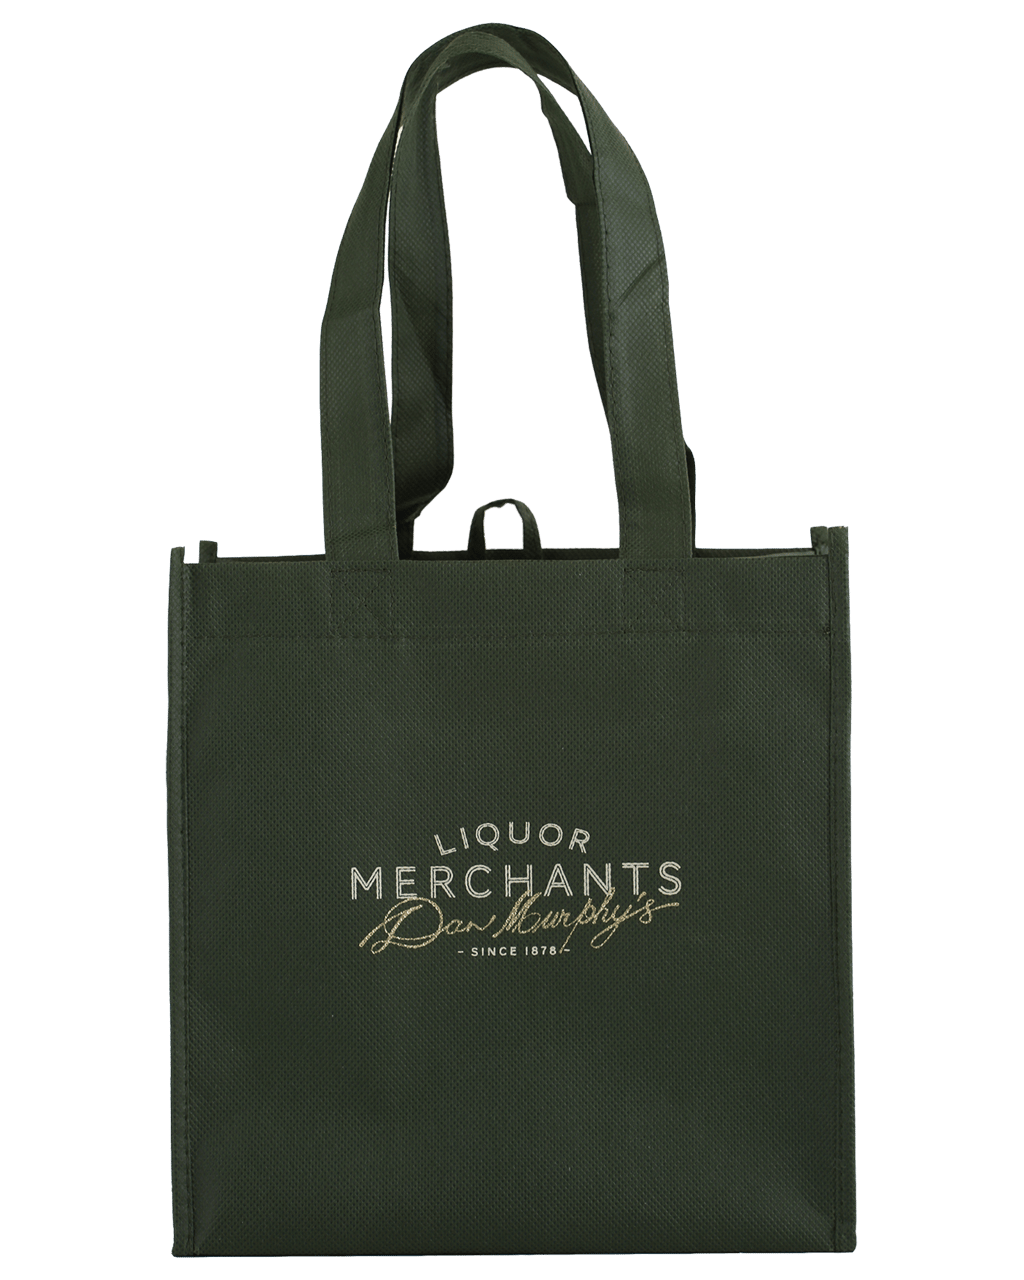 23c42c3fb Dan Murphy's Shopping Bag   Dan Murphy's   Buy Wine, Champagne, Beer ...